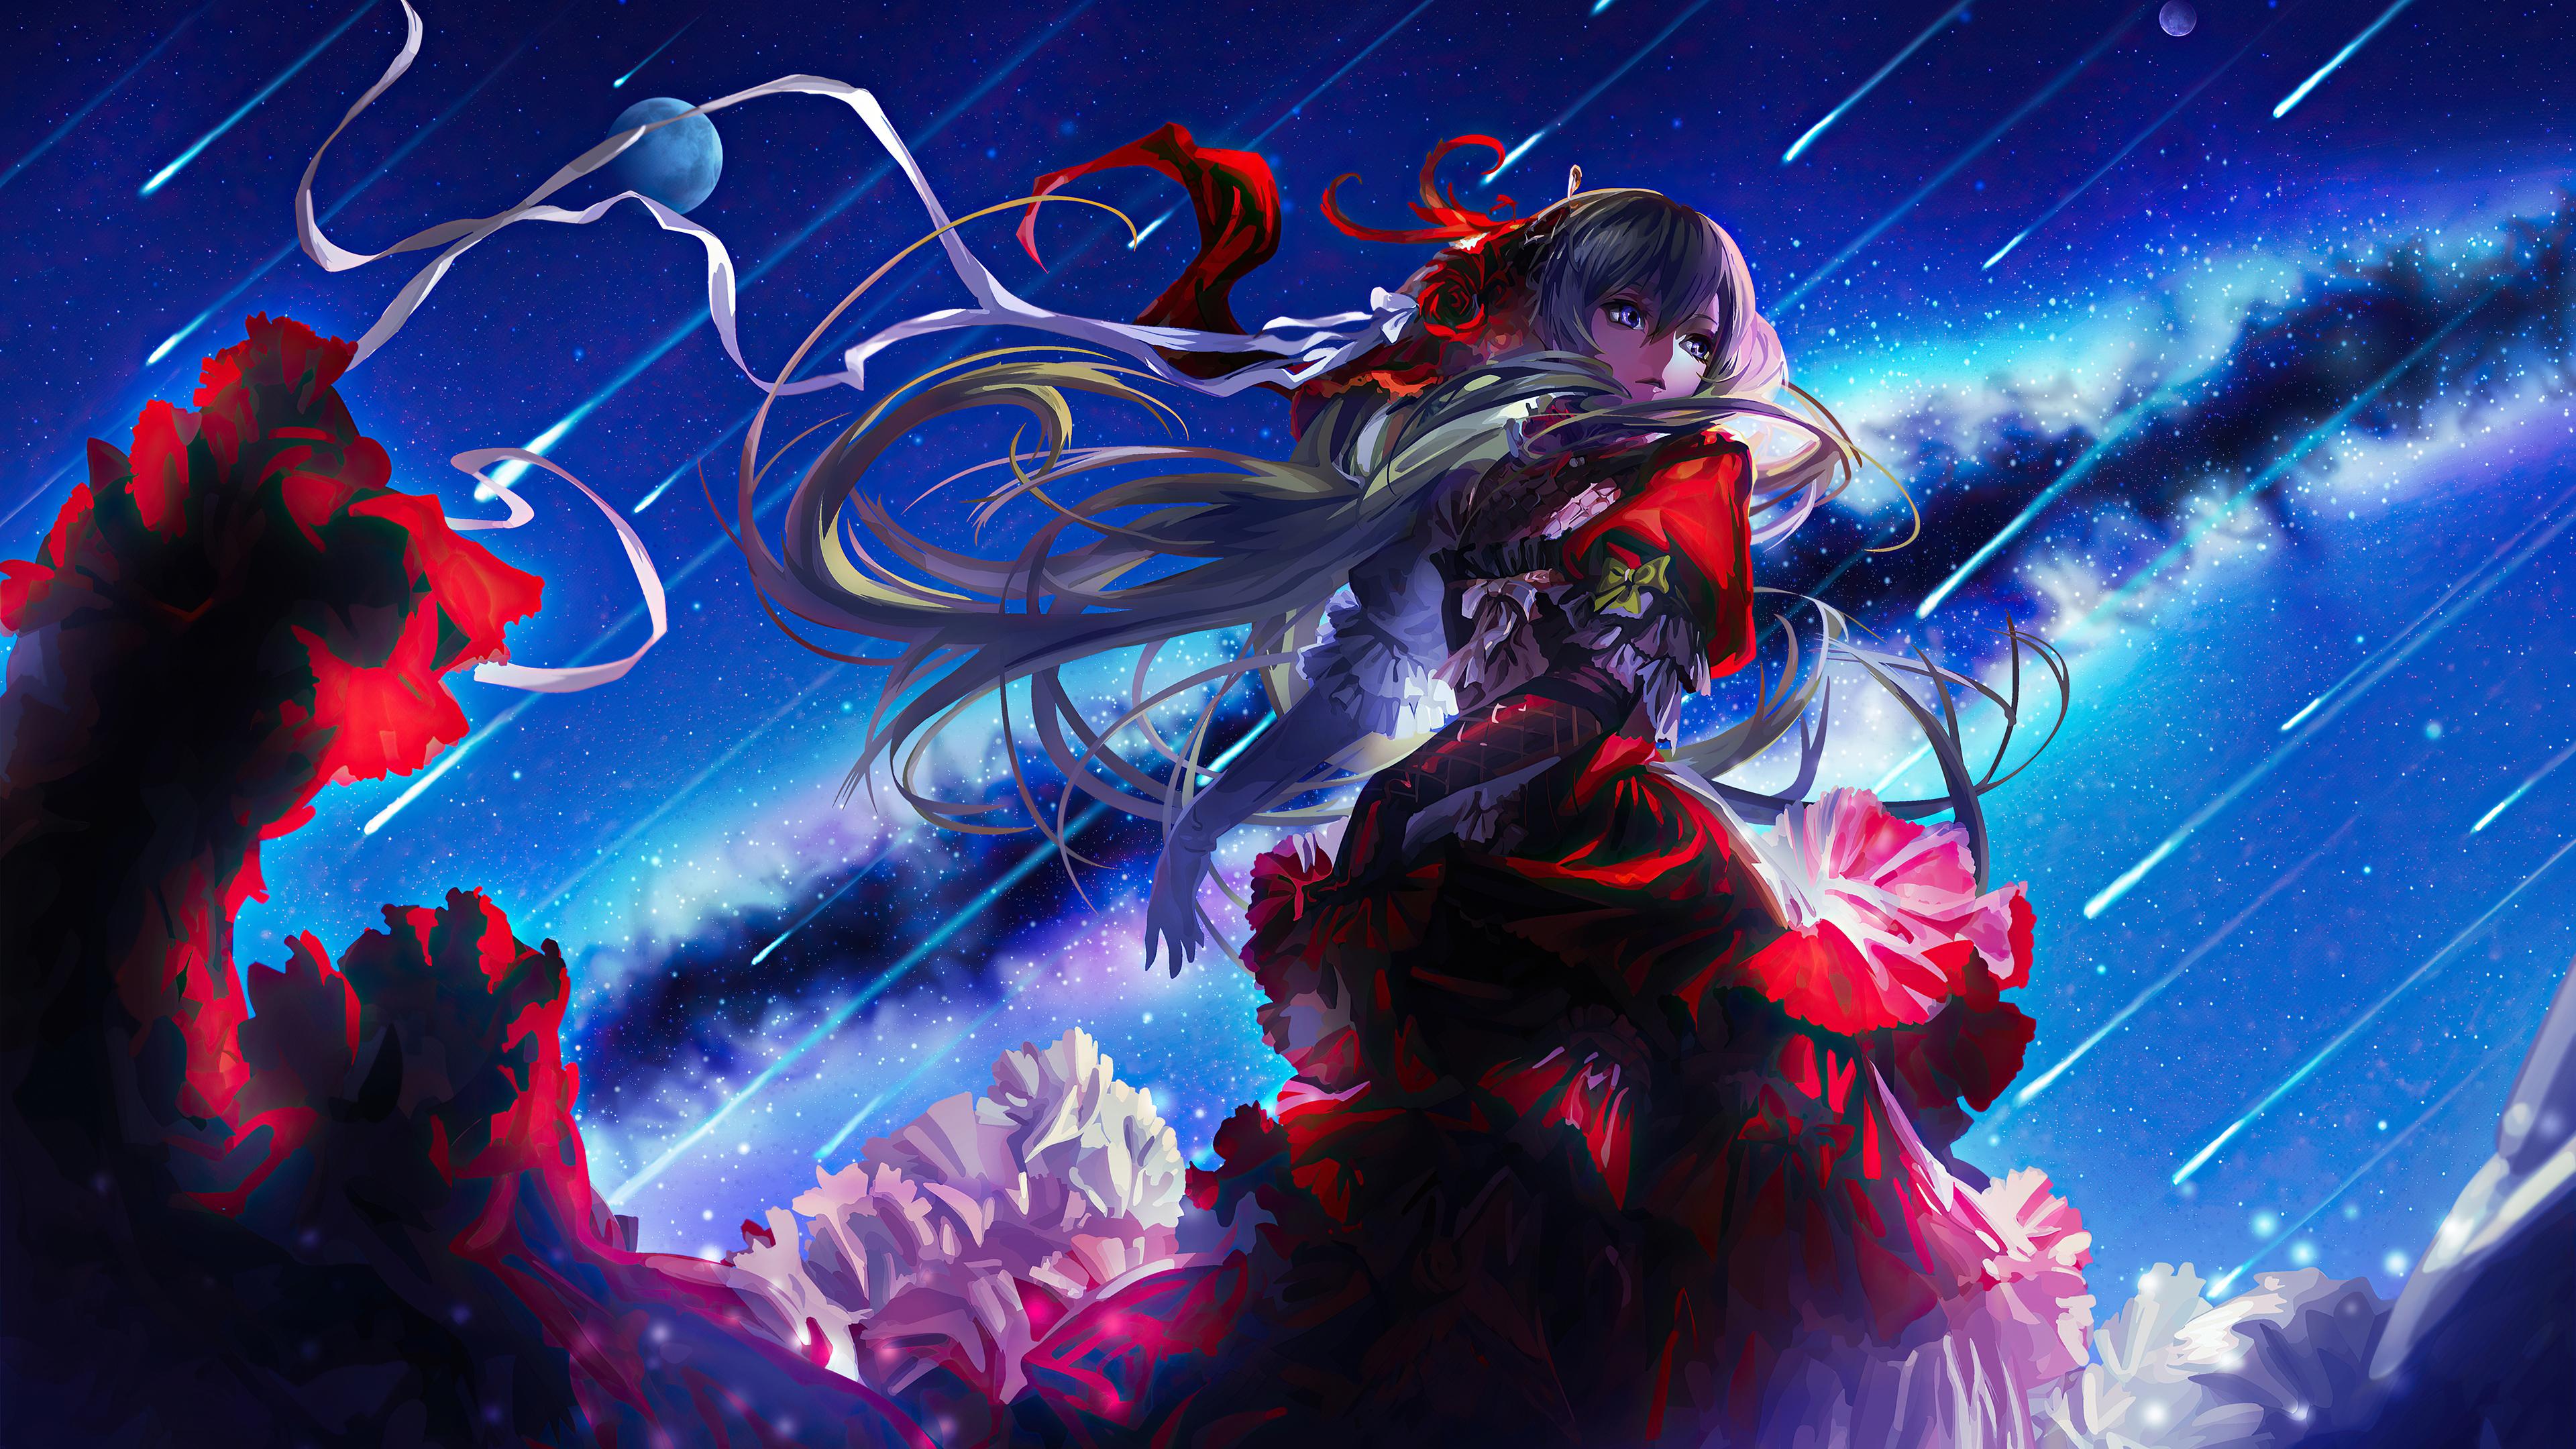 Hatsune Miku Long Hair 4k, HD Anime, 4k Wallpapers, Images ...